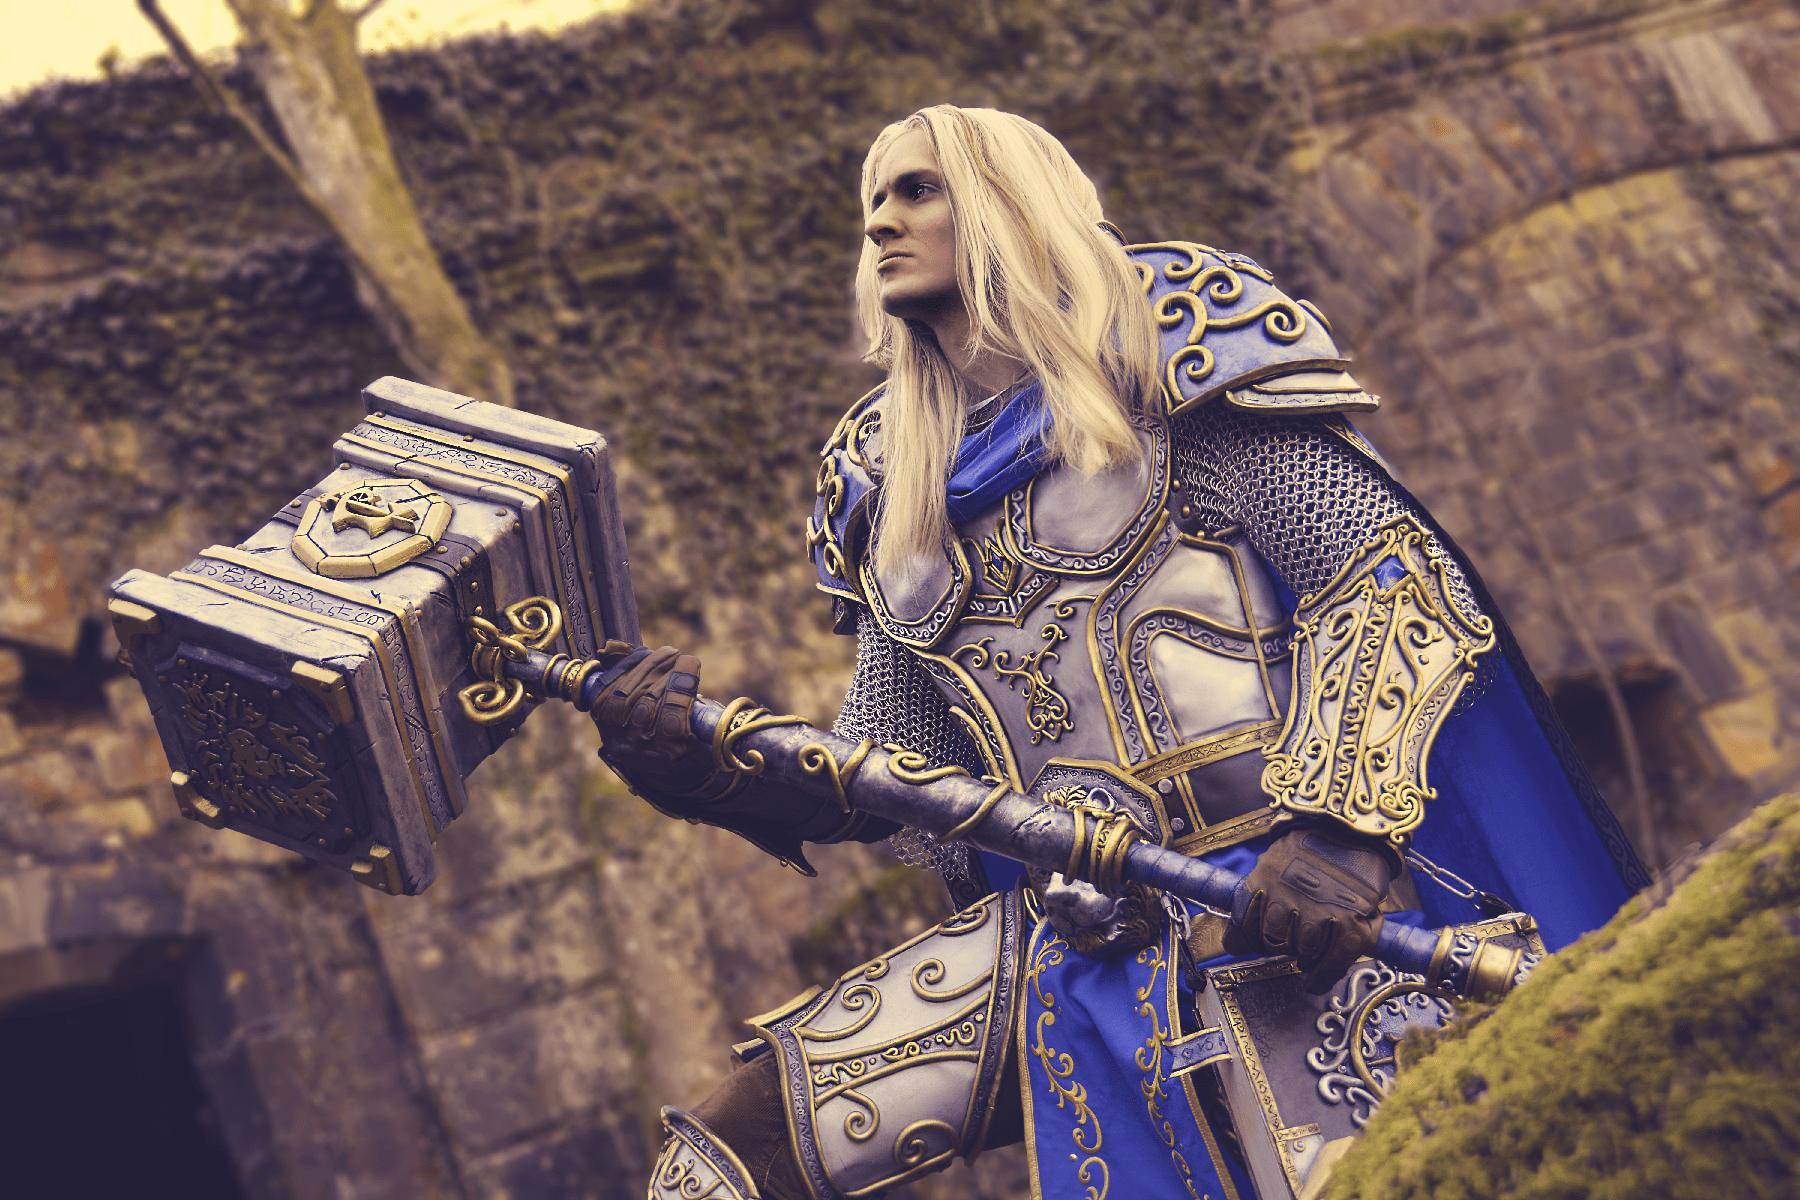 Arthas Menethil paladin cosplay